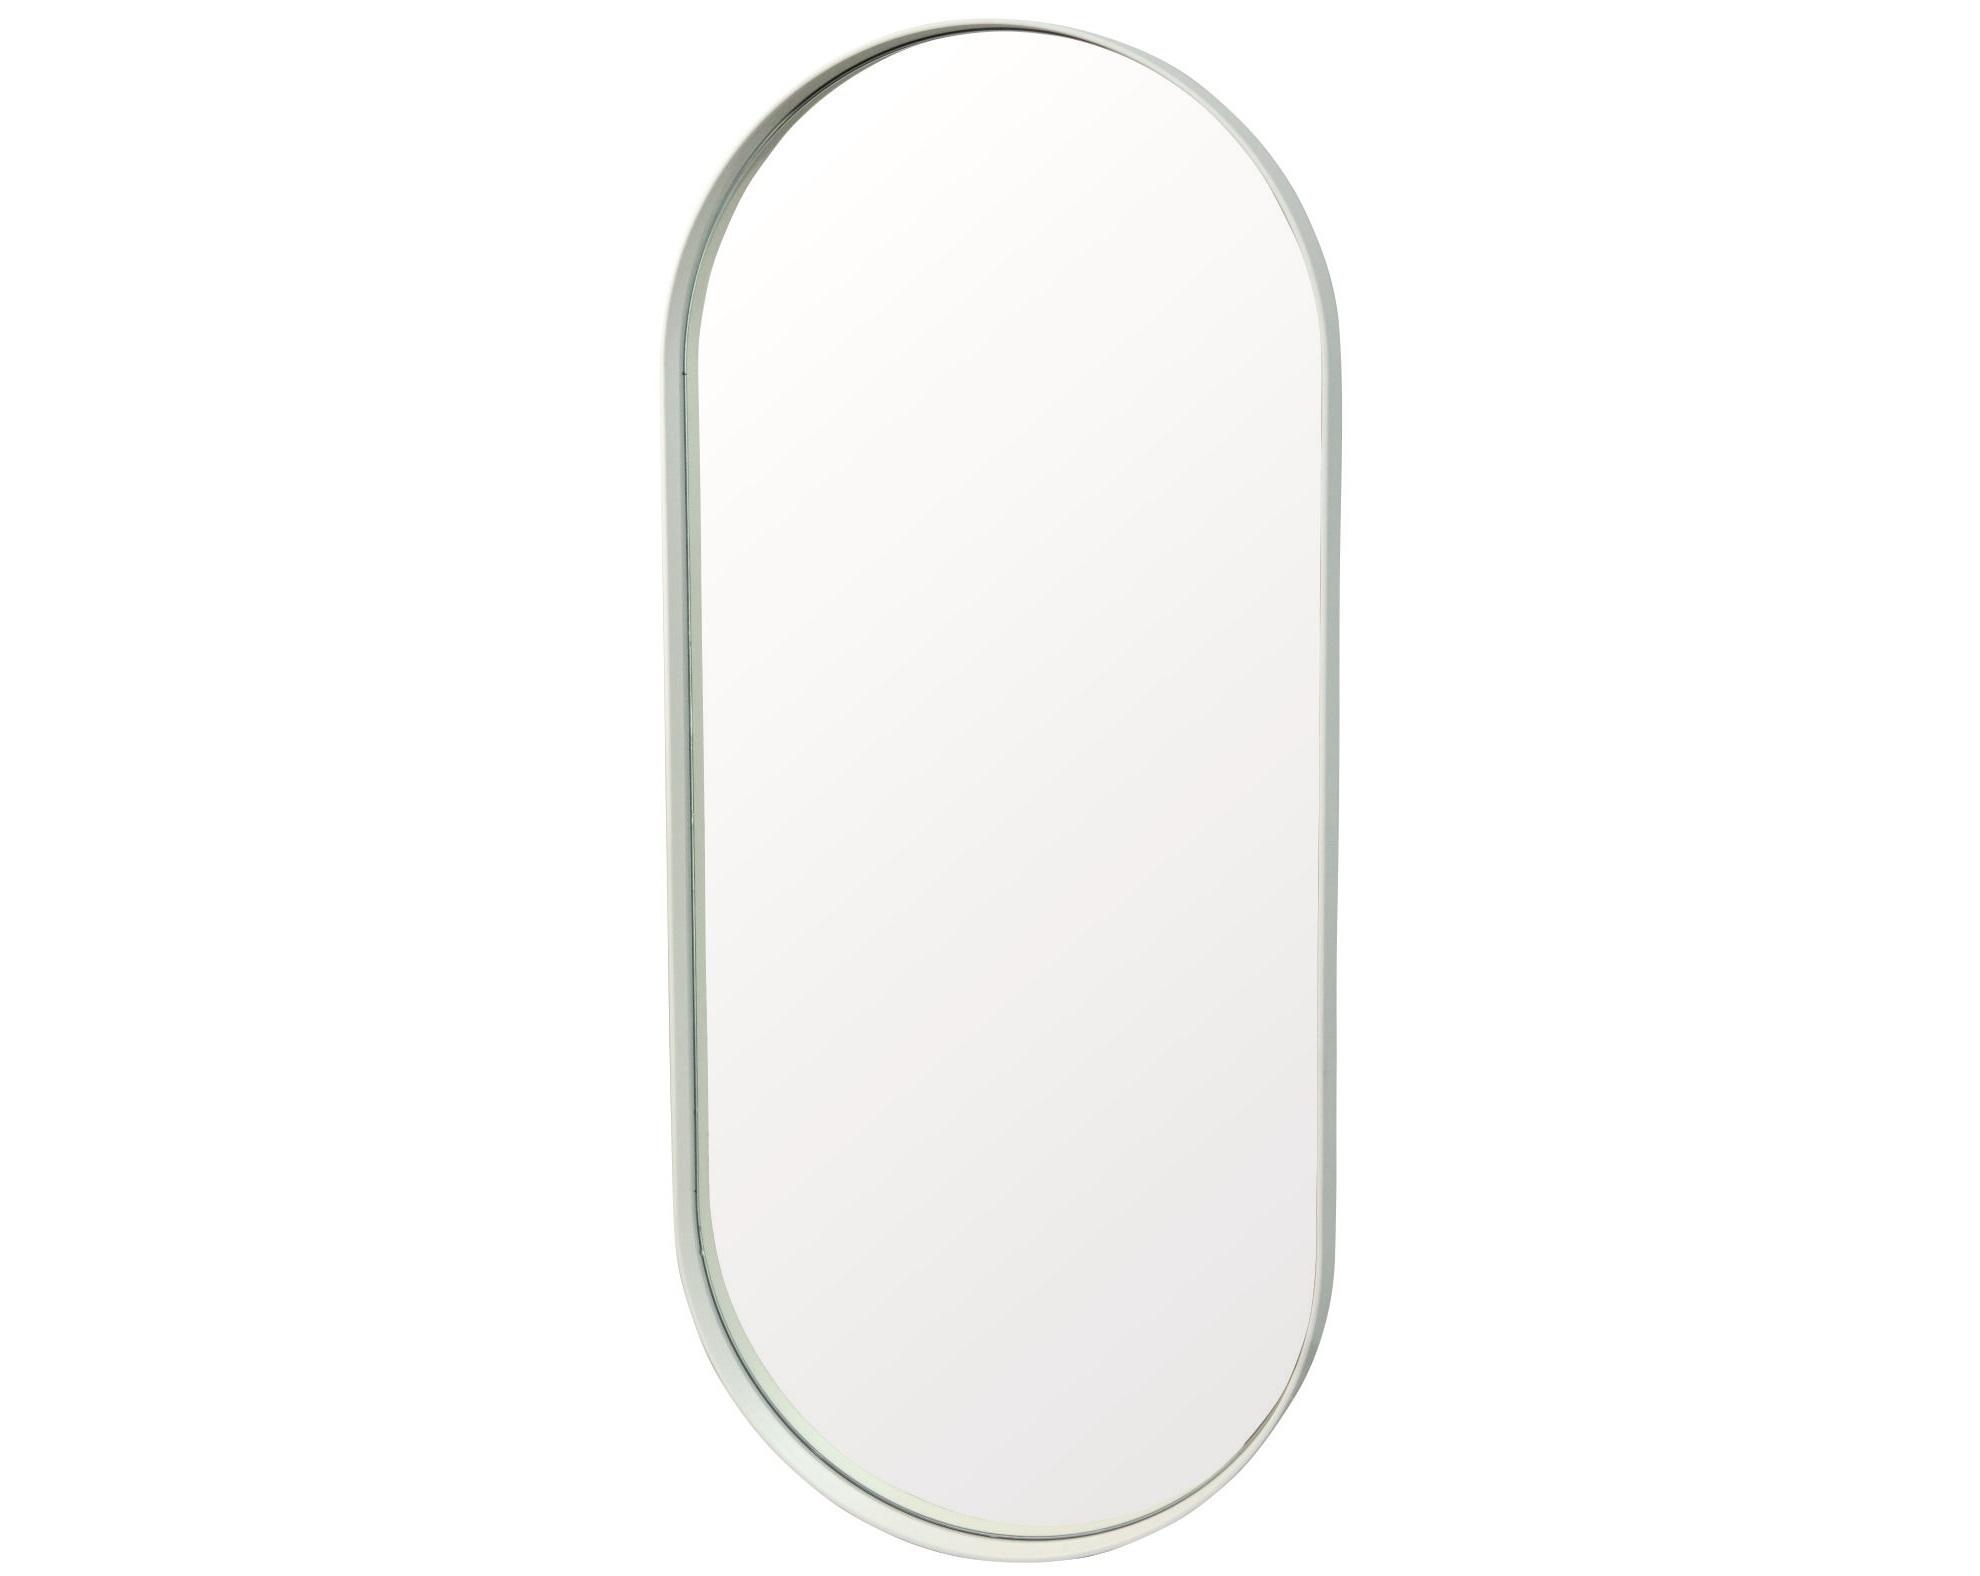 Настенное зеркало ванда 90*40 (simple mirror) белый 40x90x4 см.